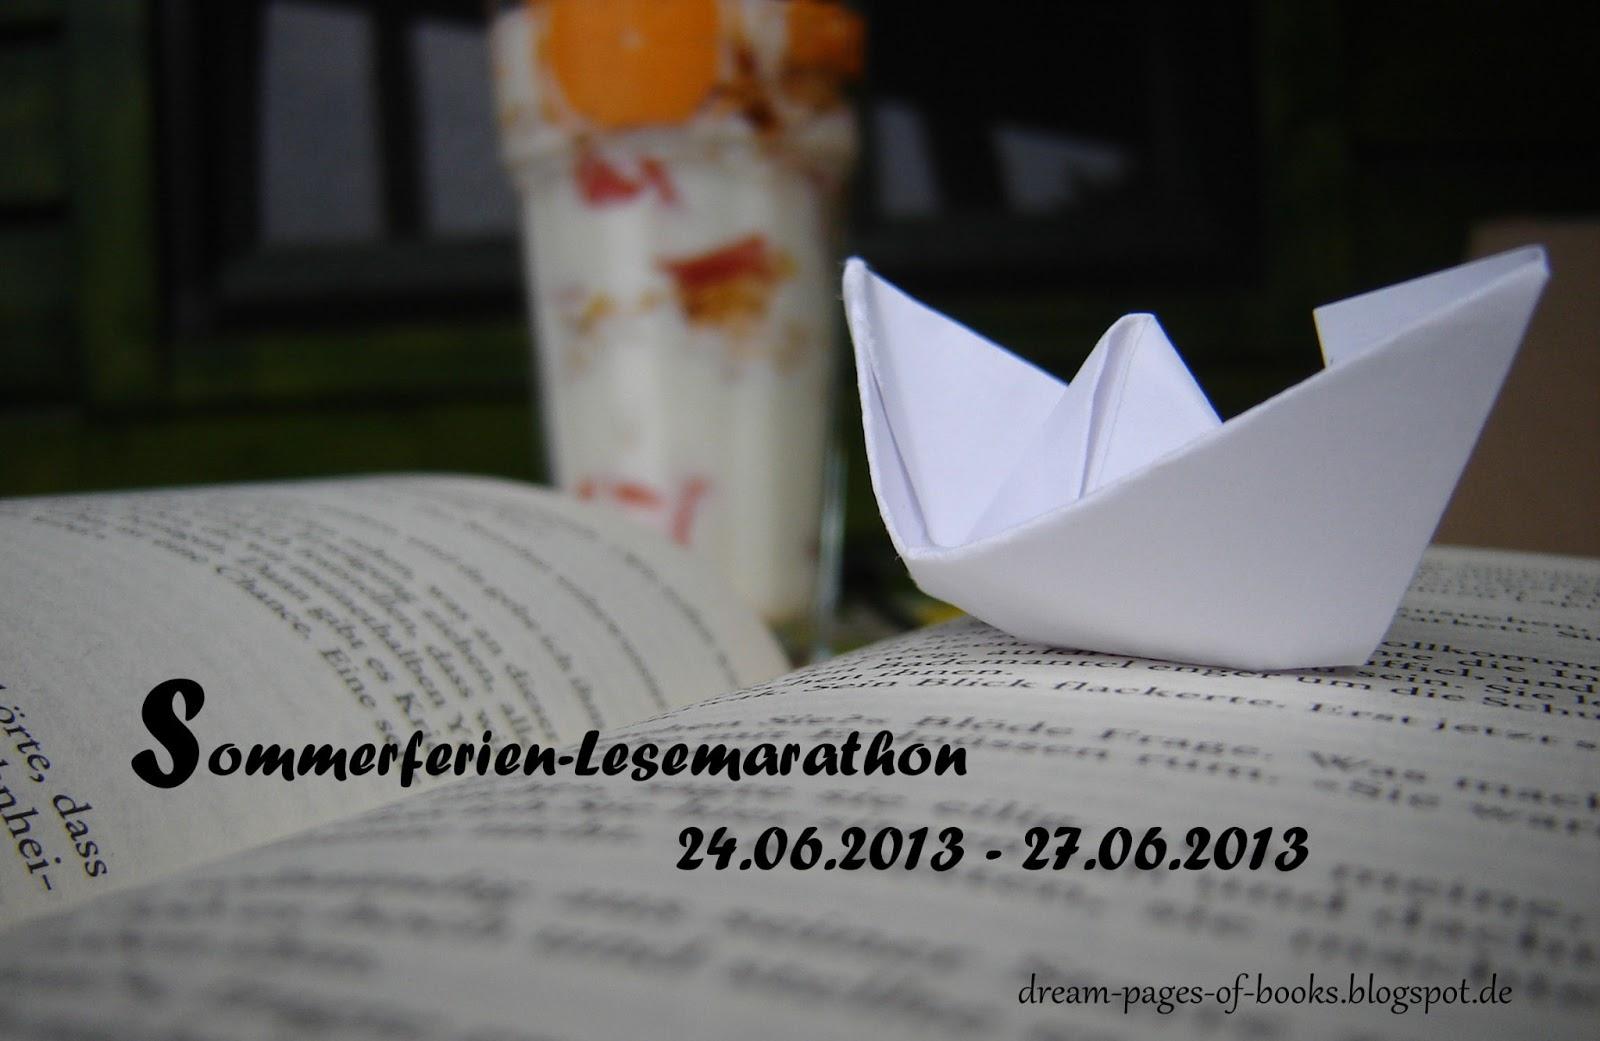 http://3.bp.blogspot.com/-mTMznLZFNpQ/UcKVnUCfT3I/AAAAAAAABmc/hBvt8_JOpAk/s1600/Lesemarathon-sommerferien.jpg